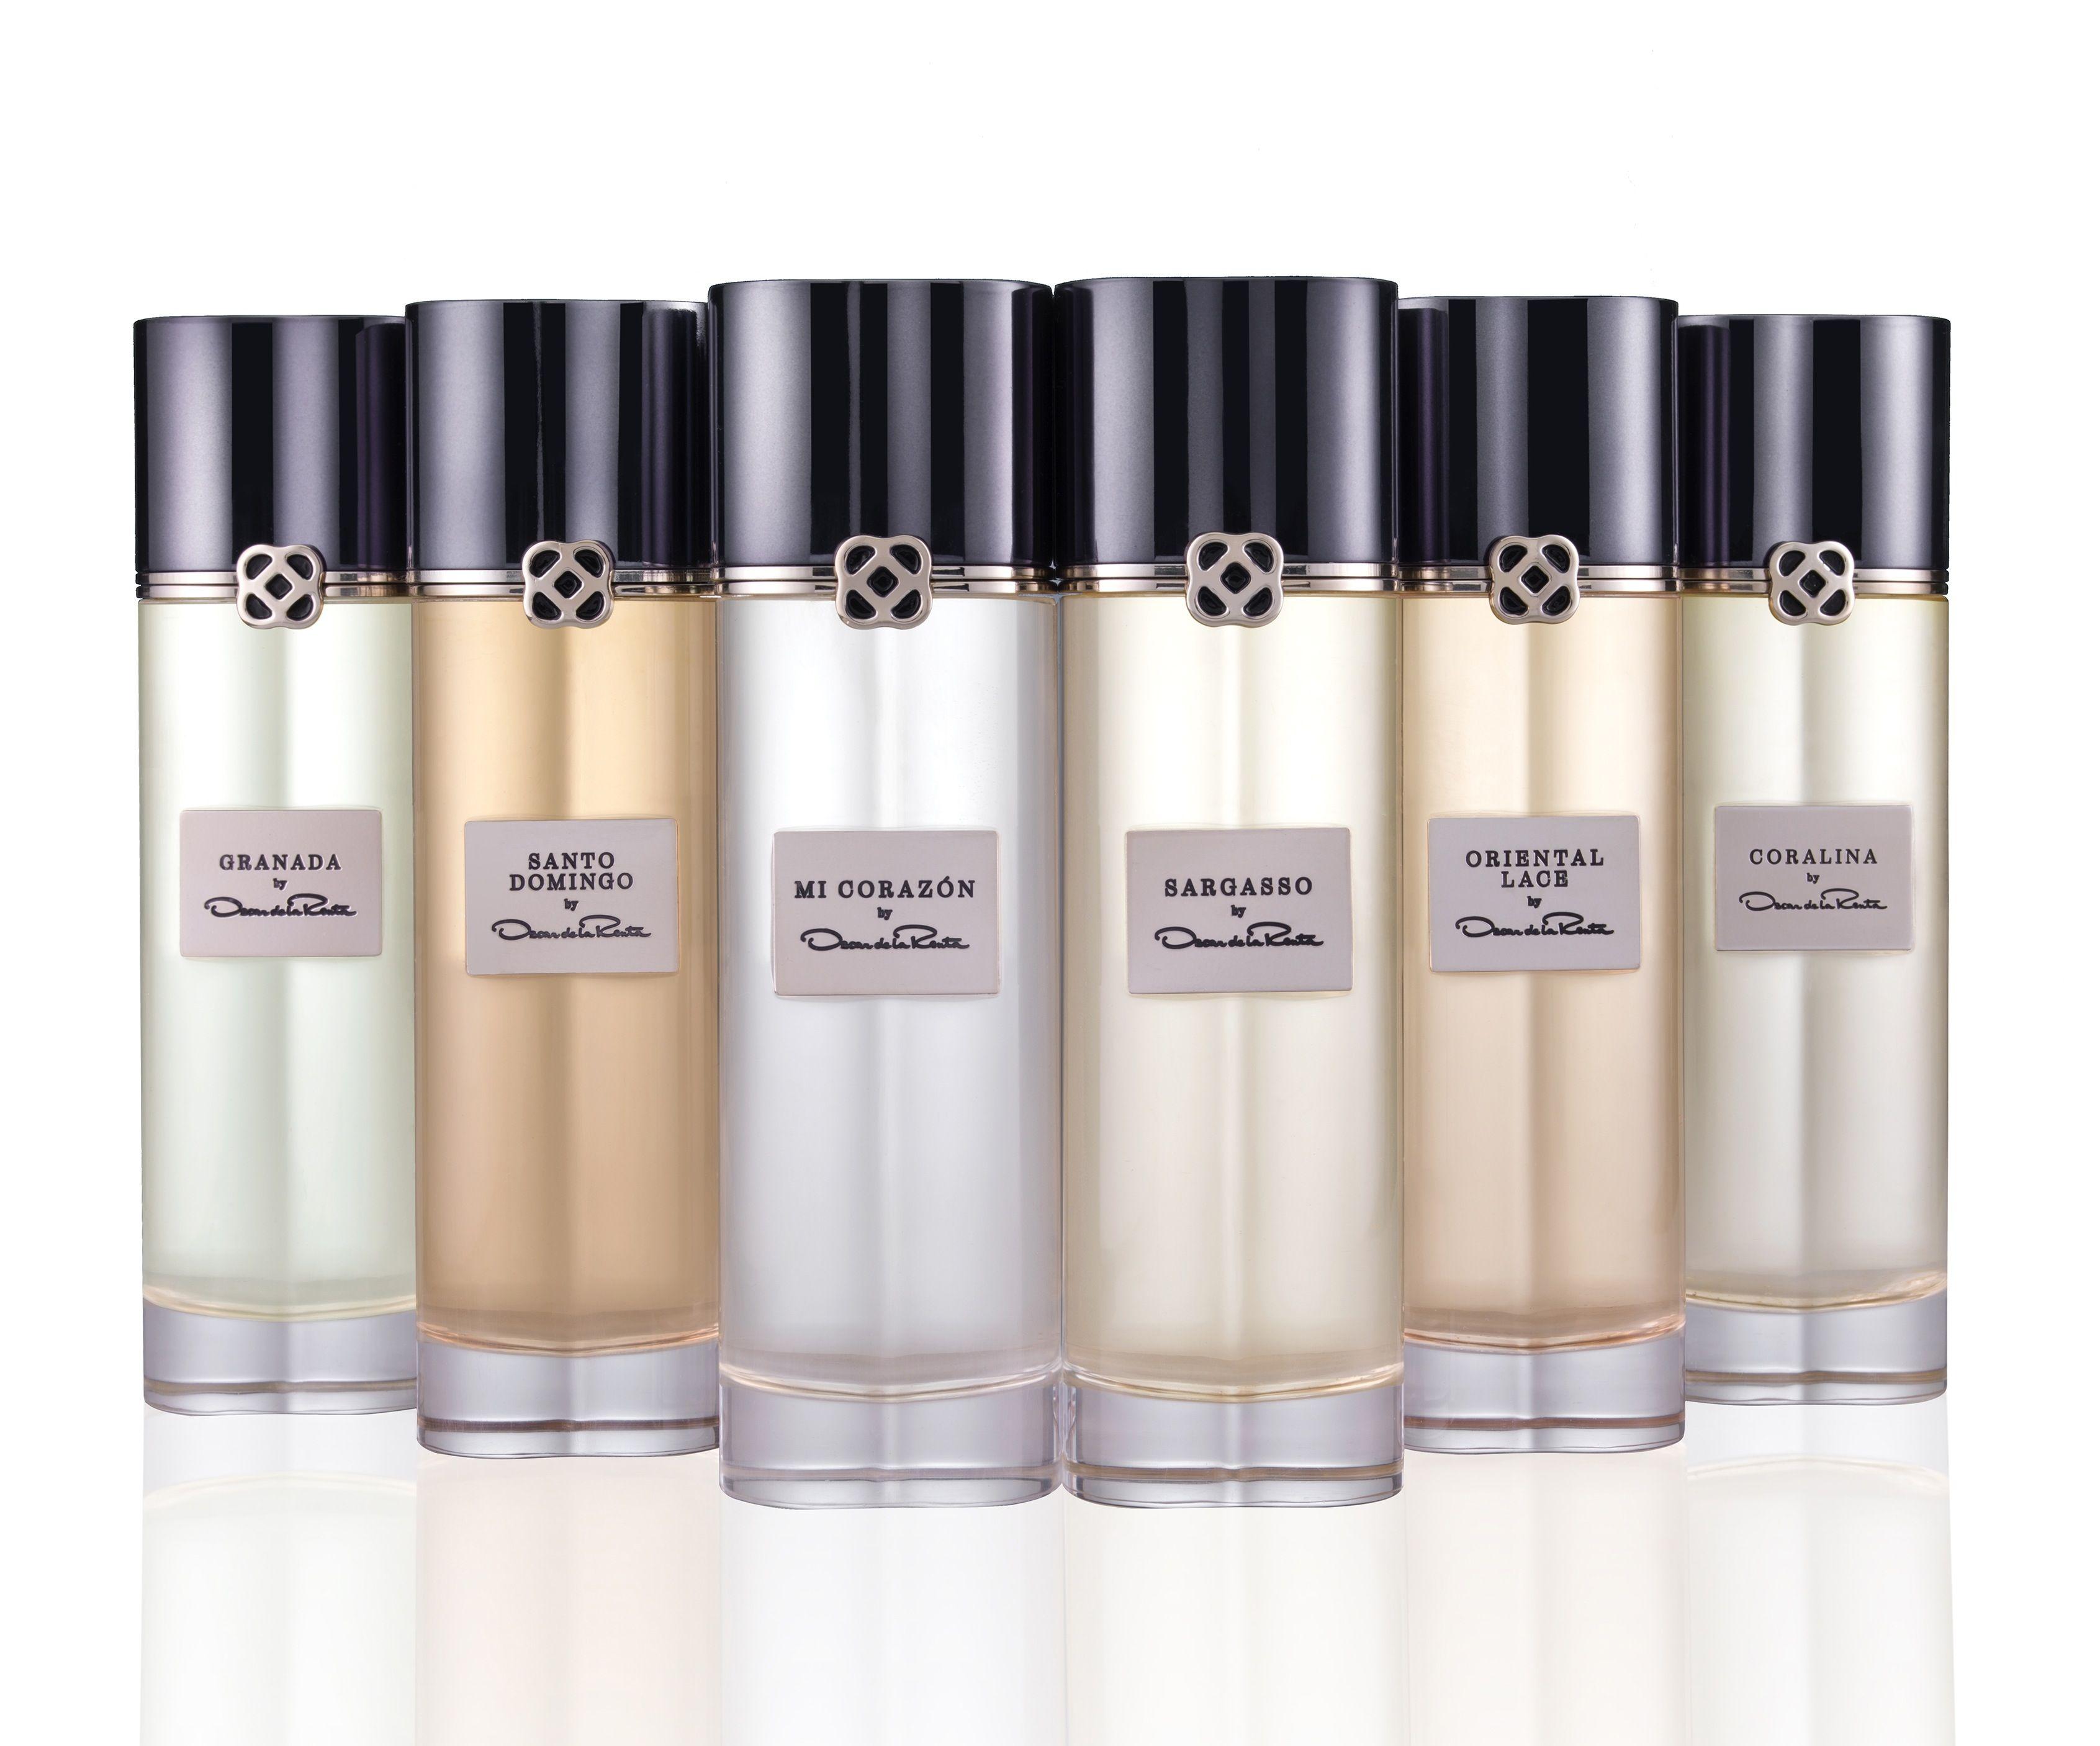 Oscar De La Renta Parfum Beauty Freebies Free Beauty Products Free Beauty Samples